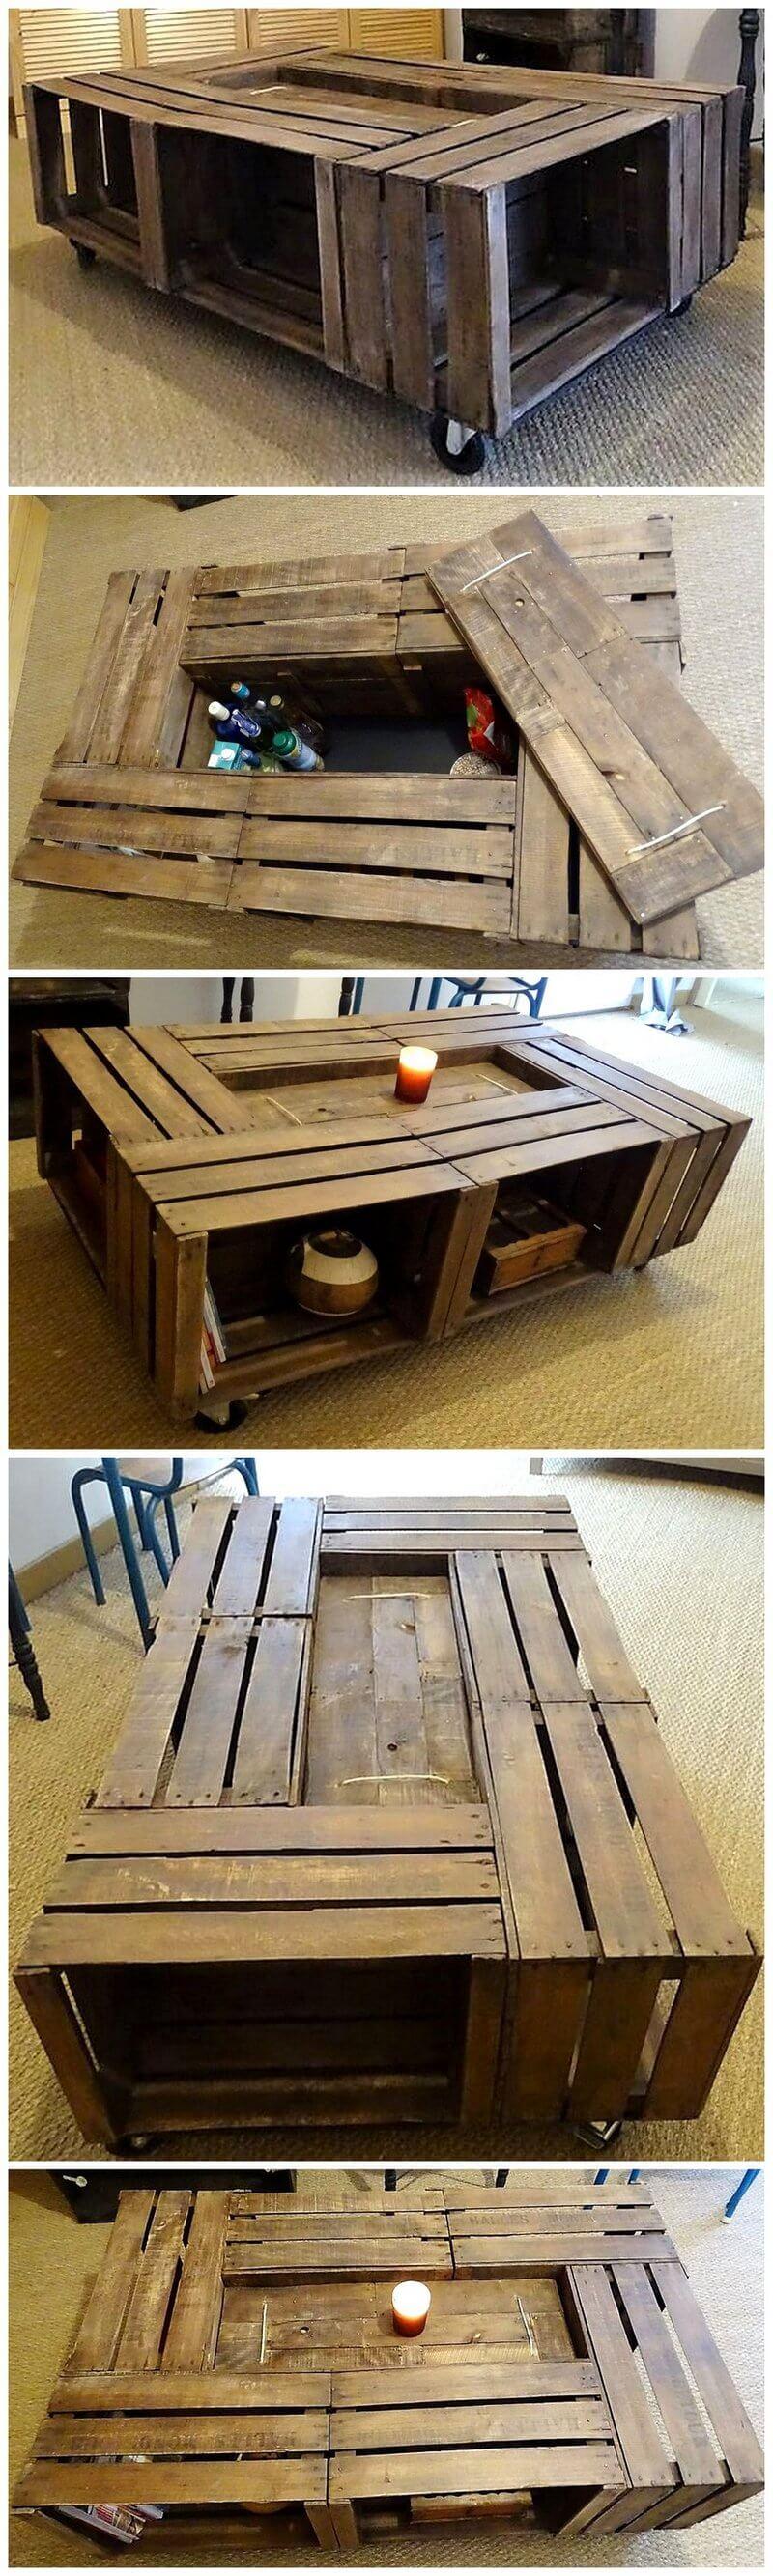 repurposed pallet rustic table